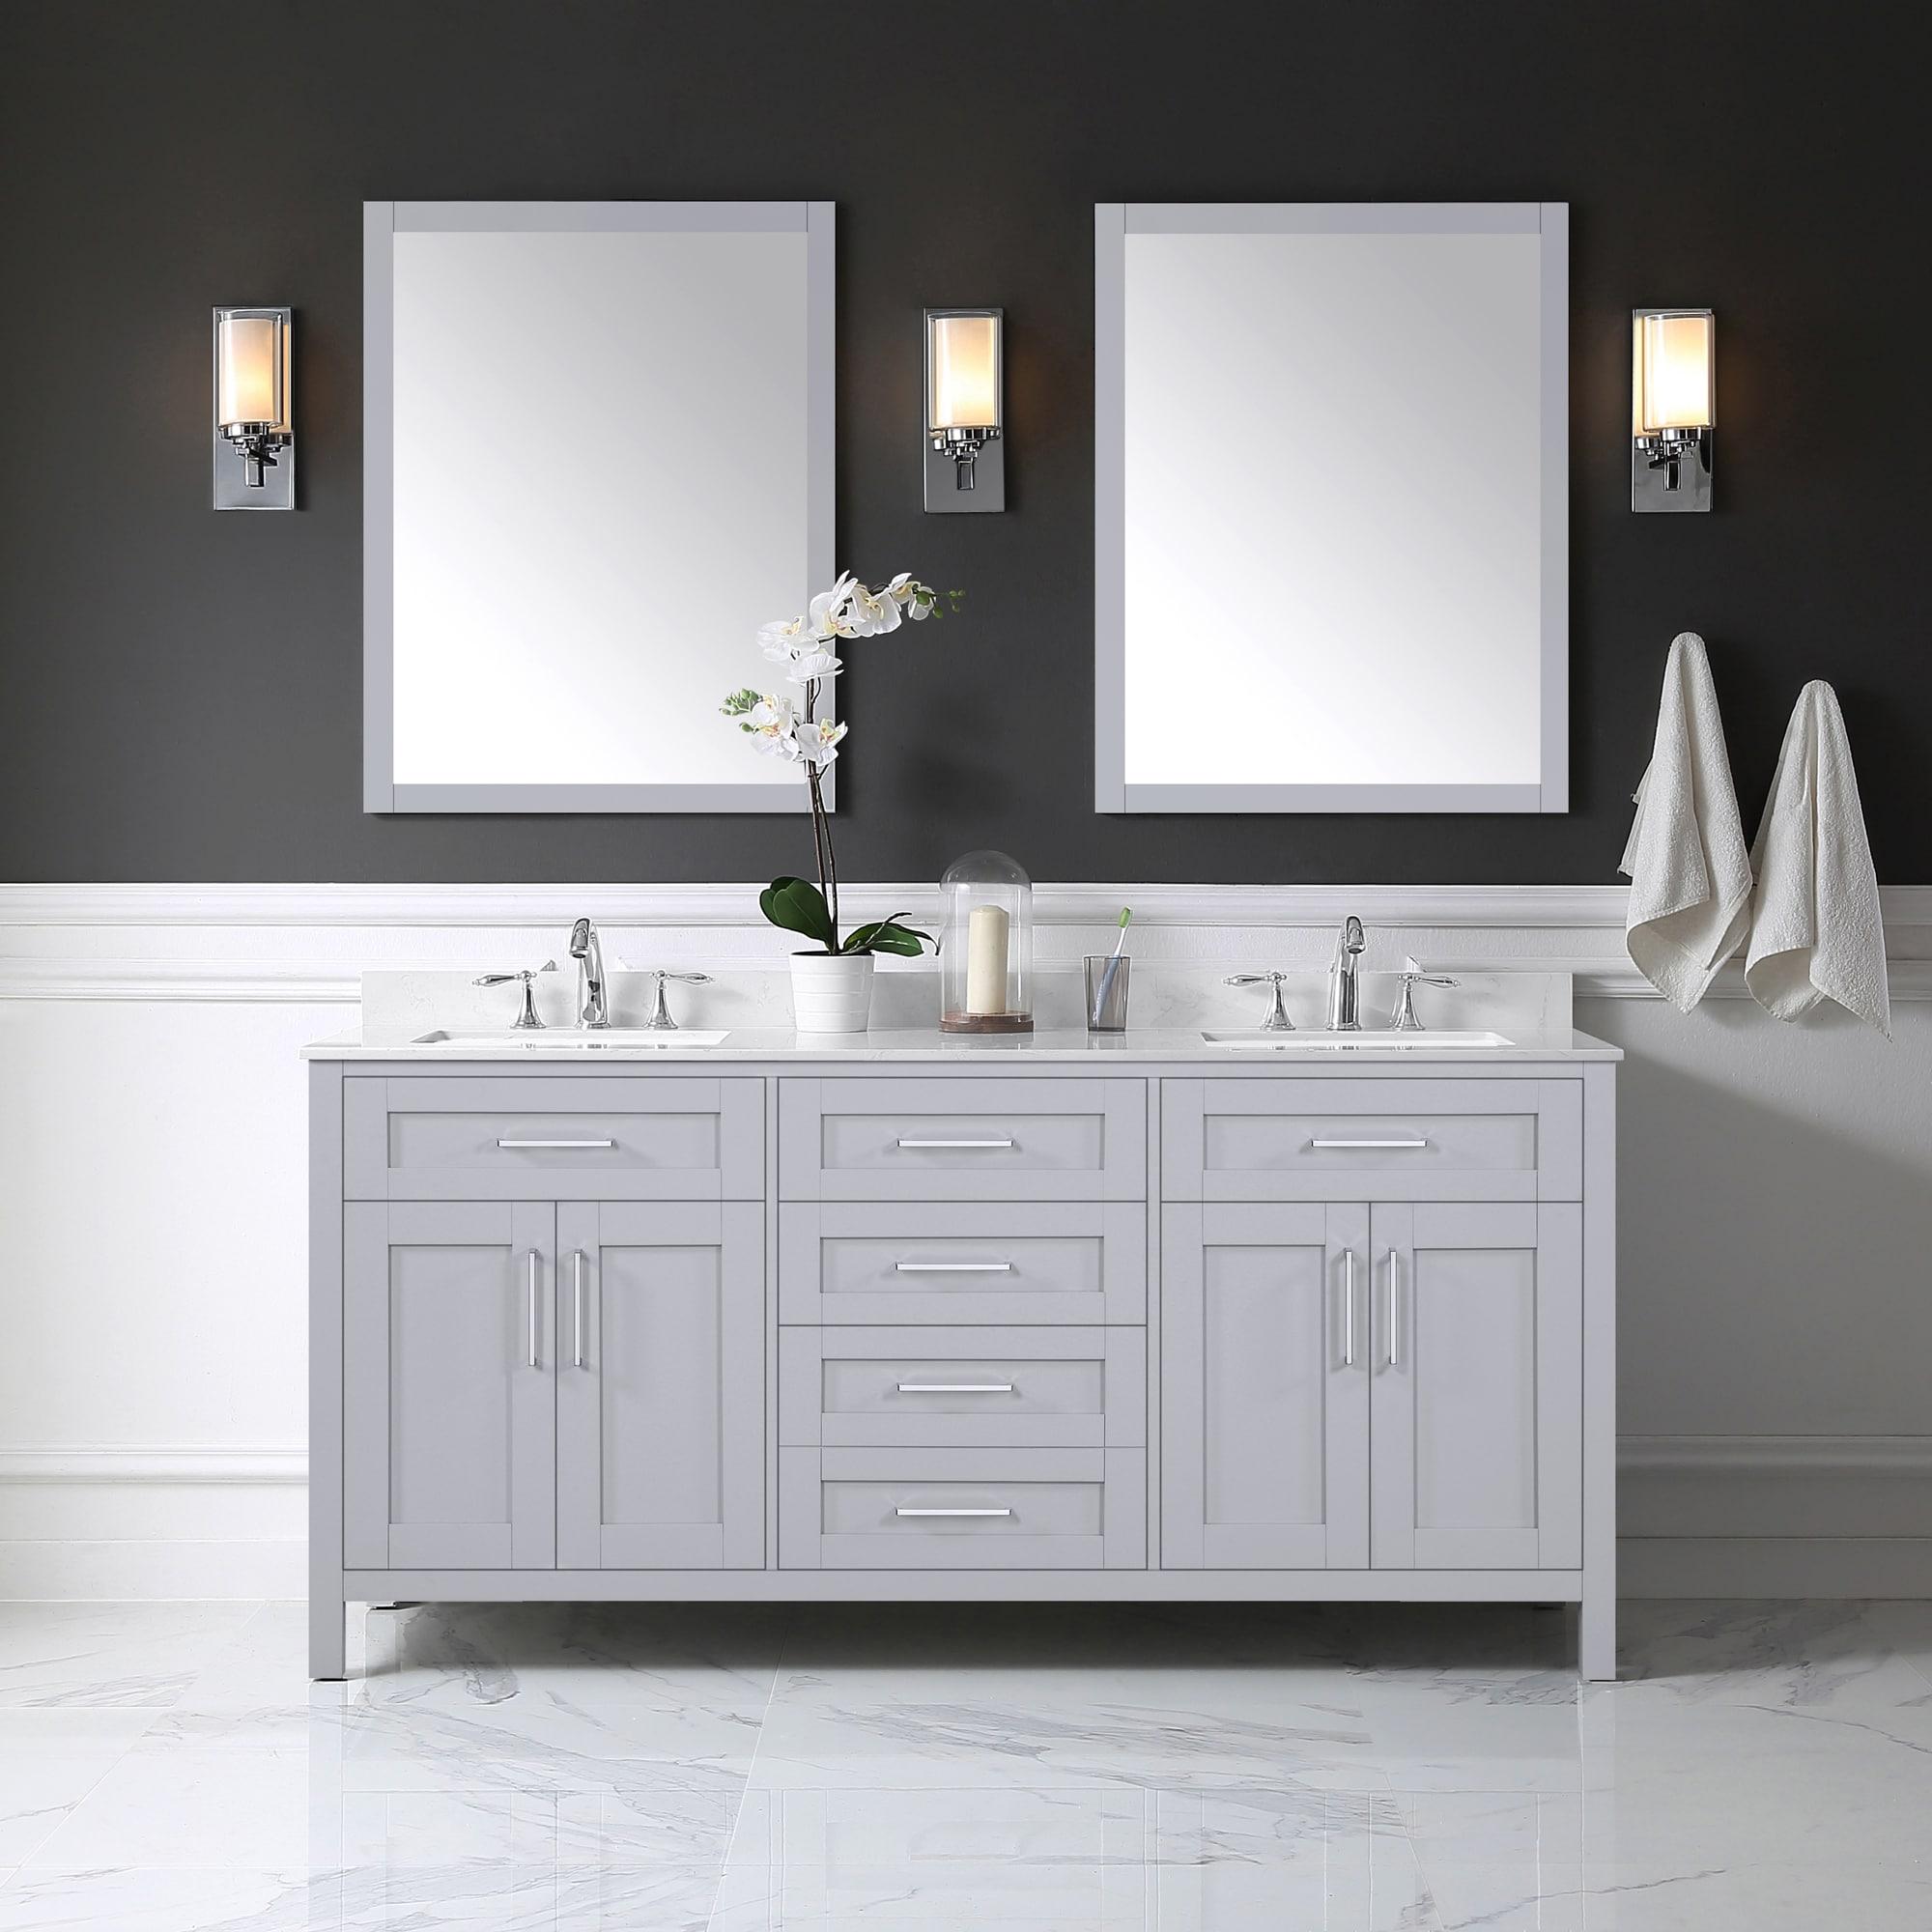 OVE Decors Tahoe 20 in Dove Gray Undermount Double Sink Bathroom ...